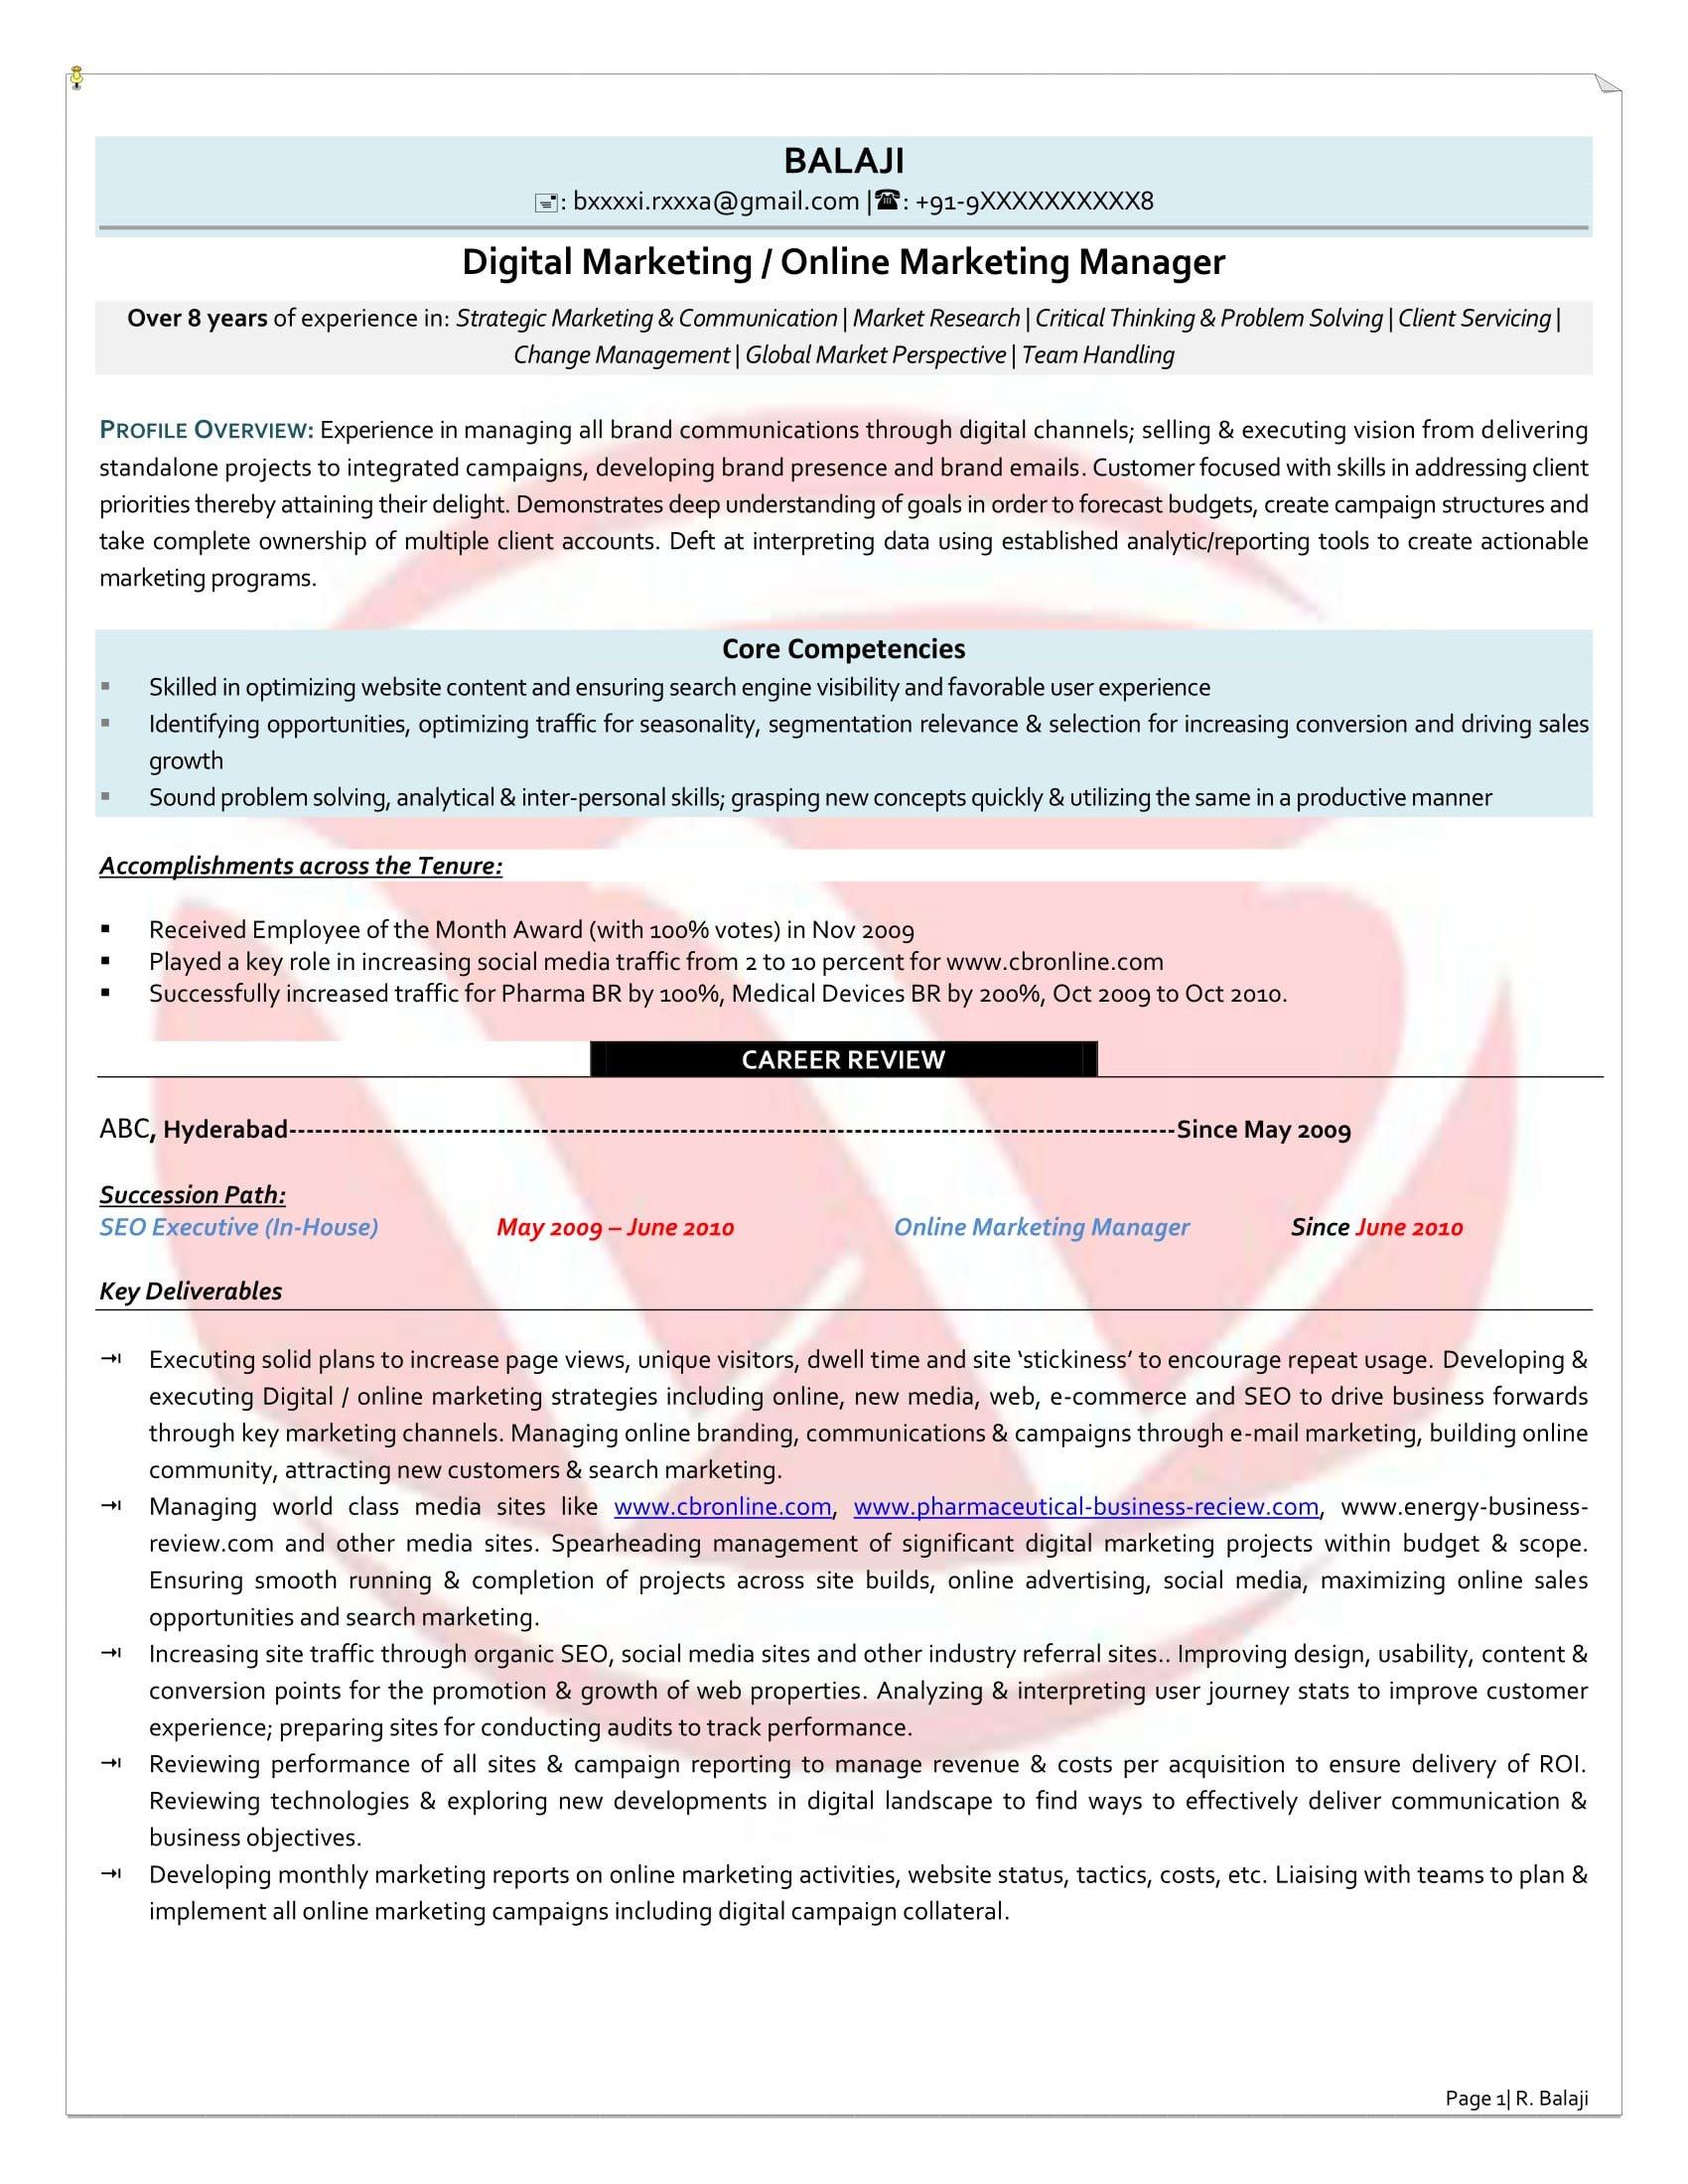 Digital Marketing Resume Sample Digital Marketing Sample Resumes Download Resume format